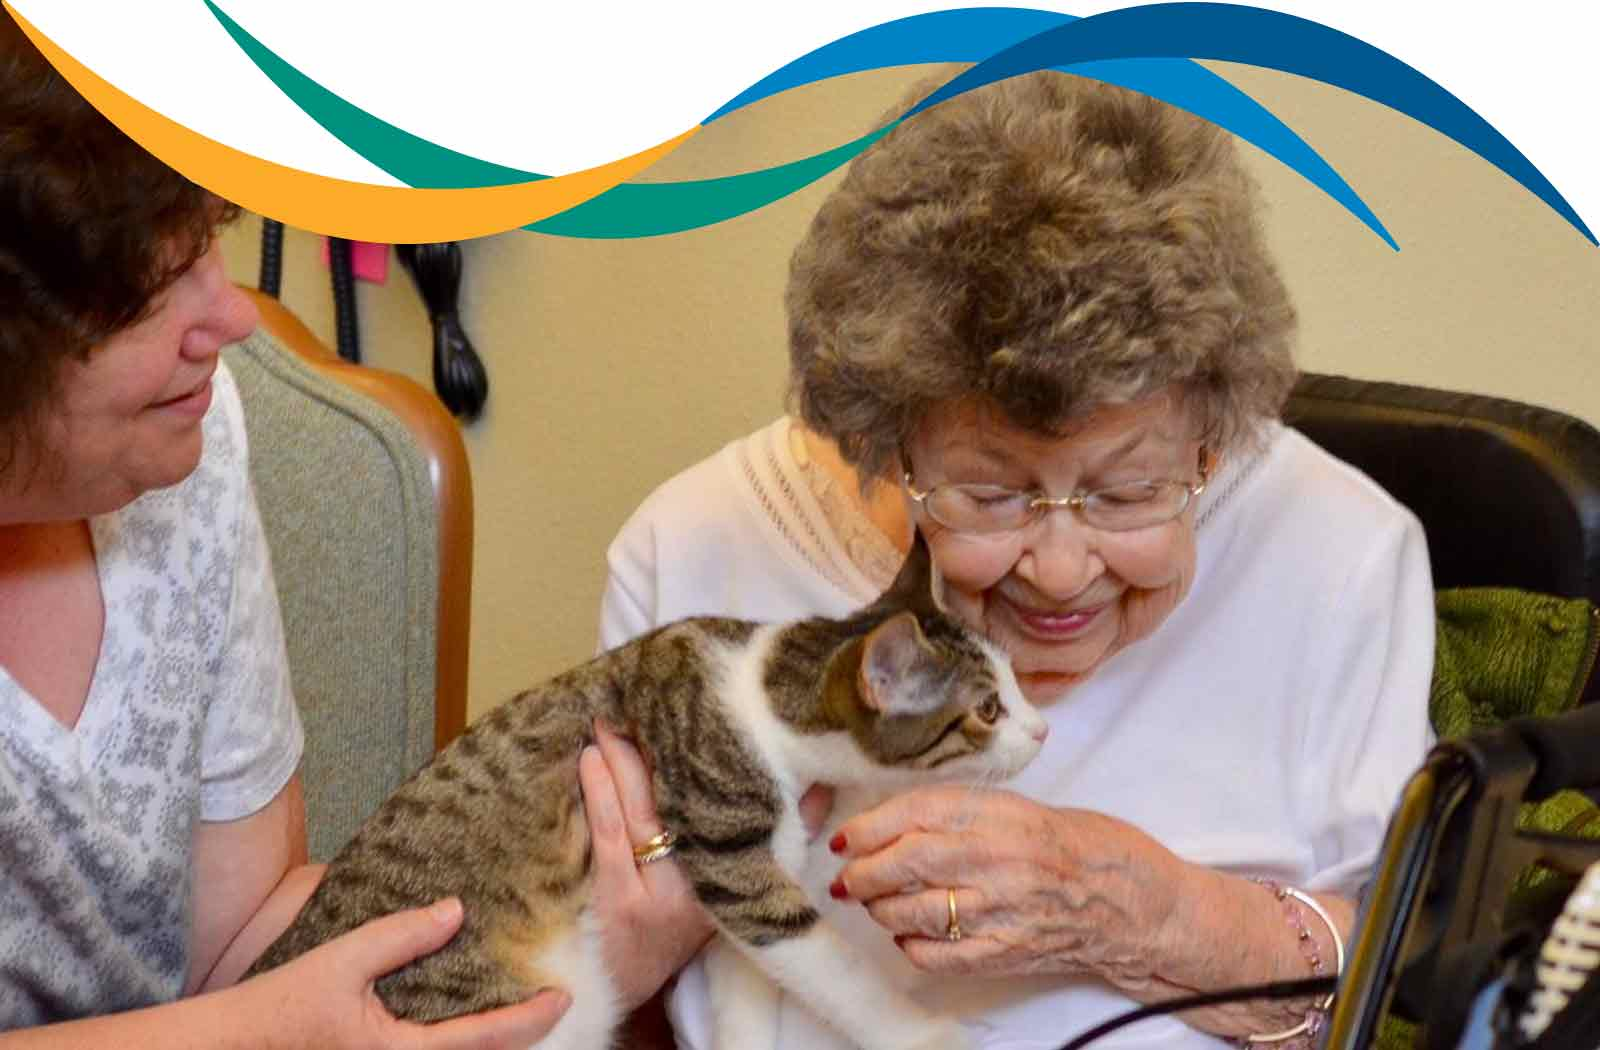 Sheboygan Senior Community Resident Enjoys a Visit from a Furry Friend